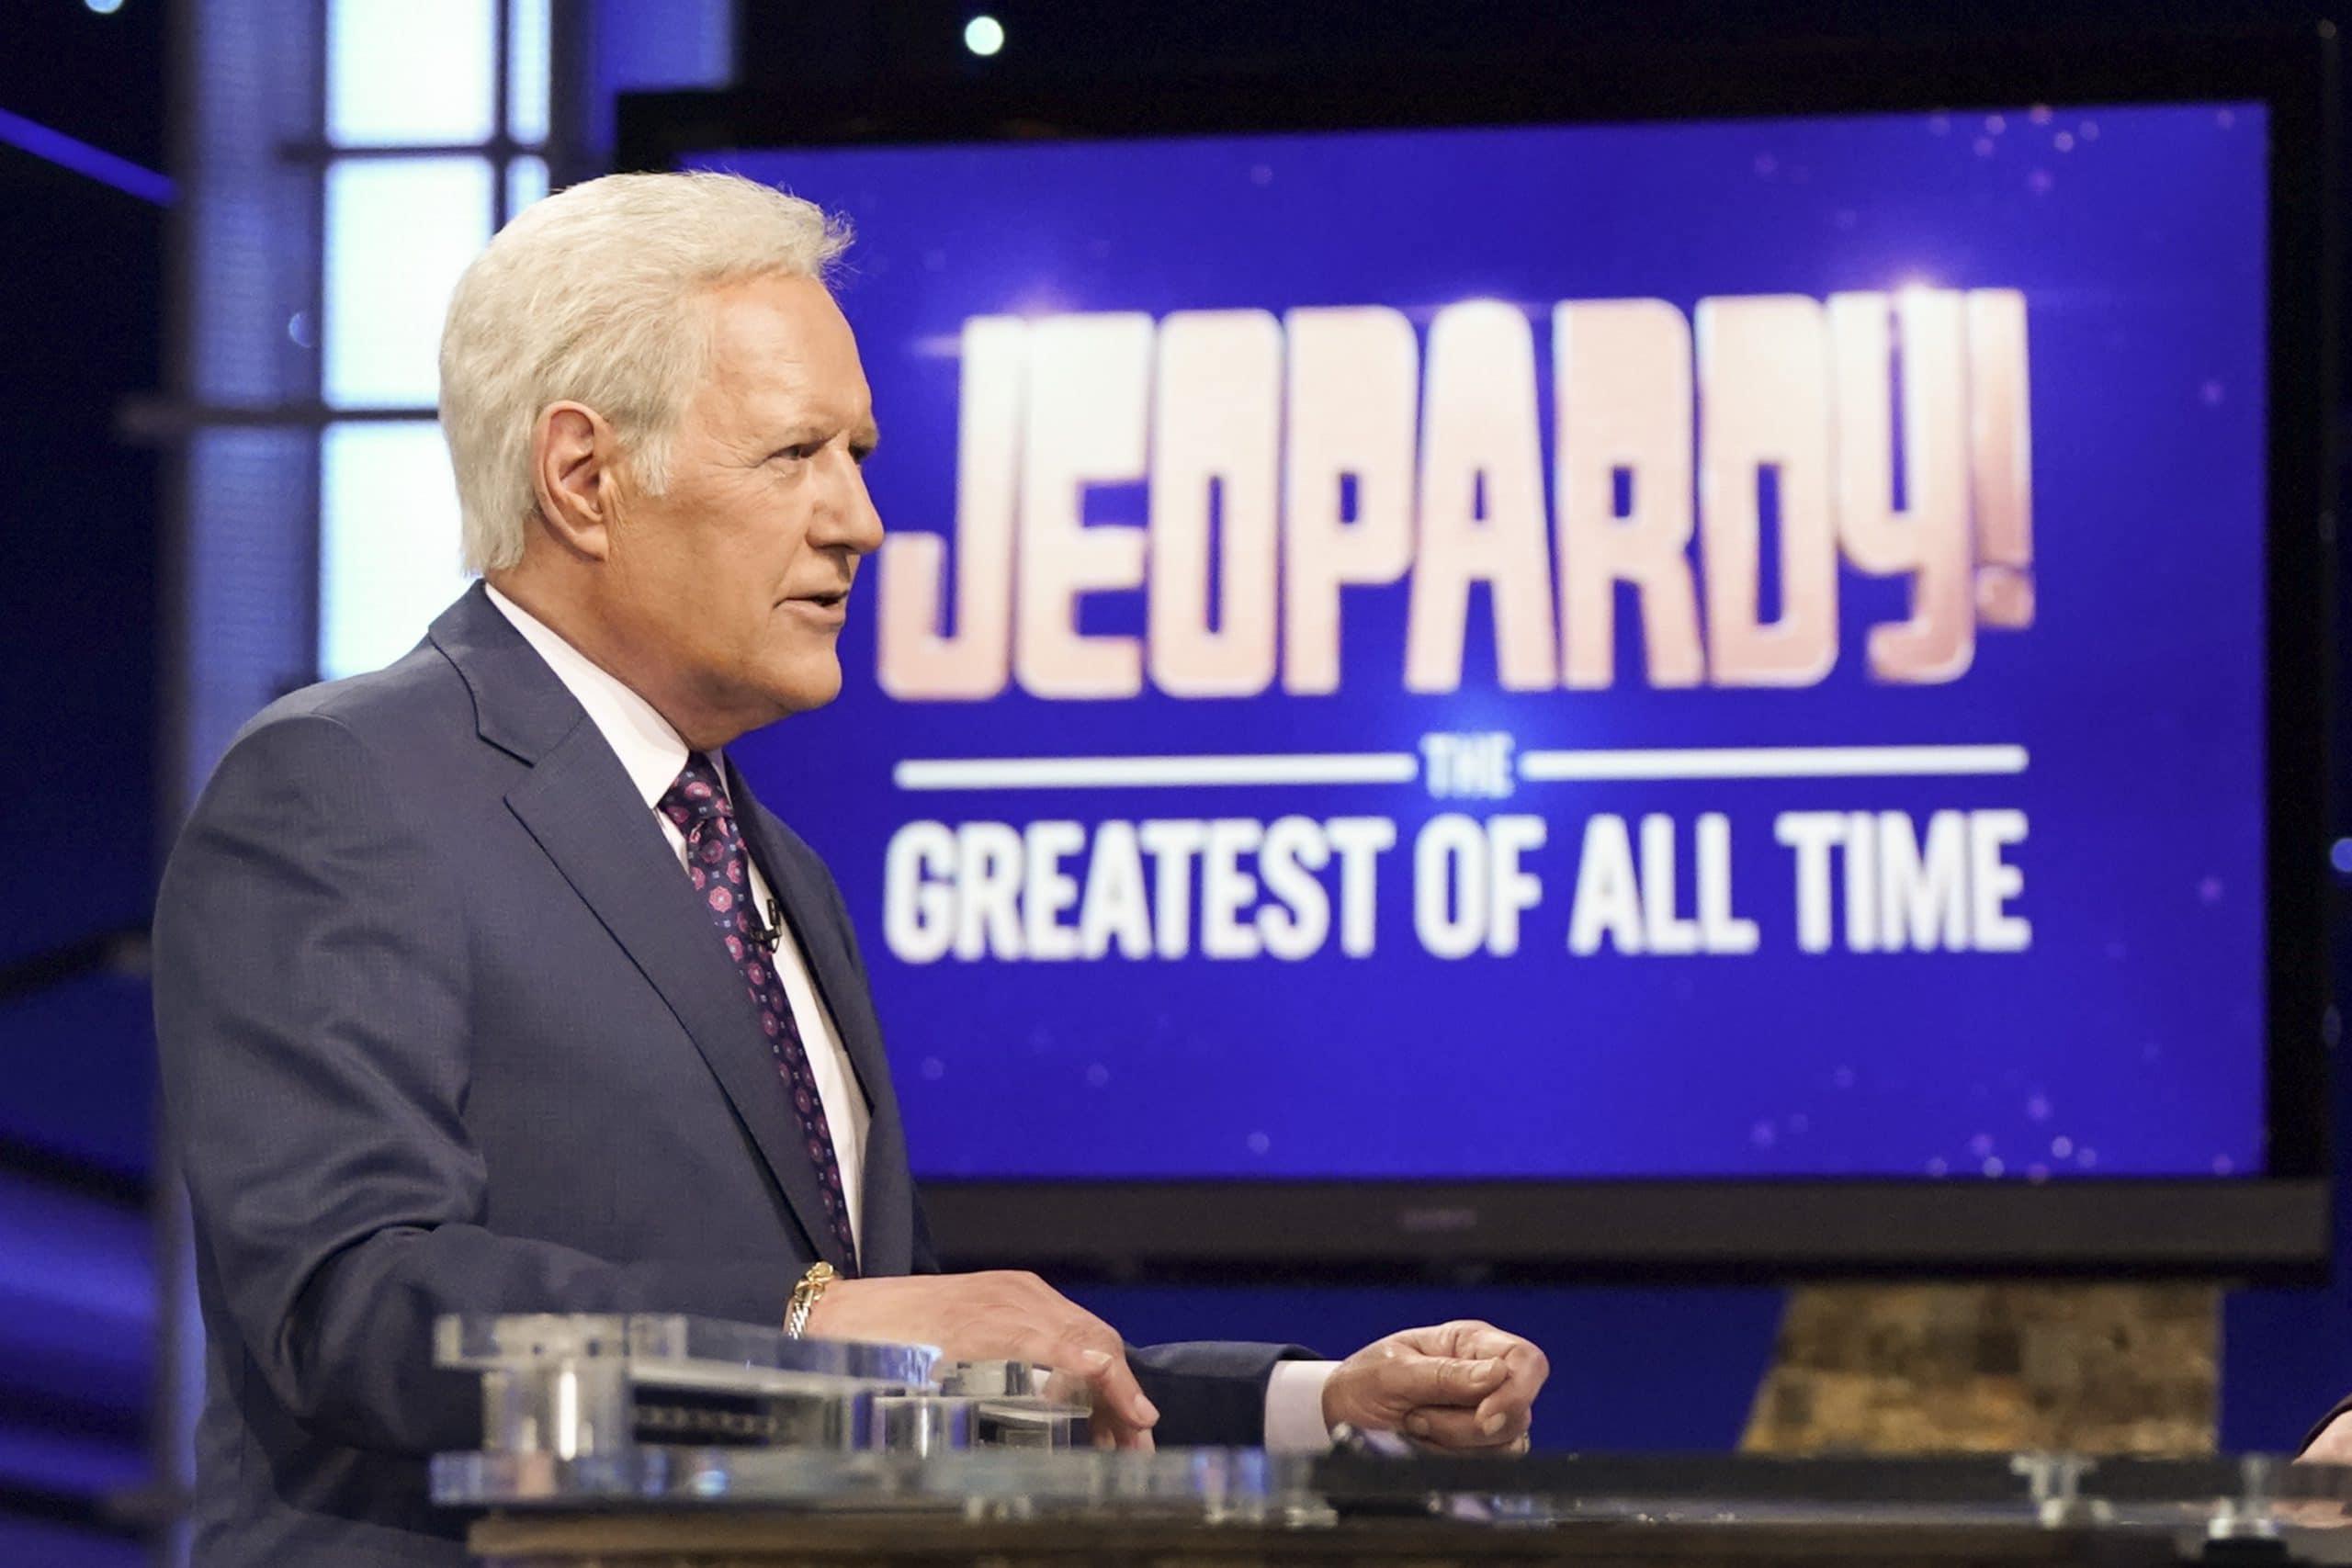 jeopardy greatest of all time tournament alex trebek host